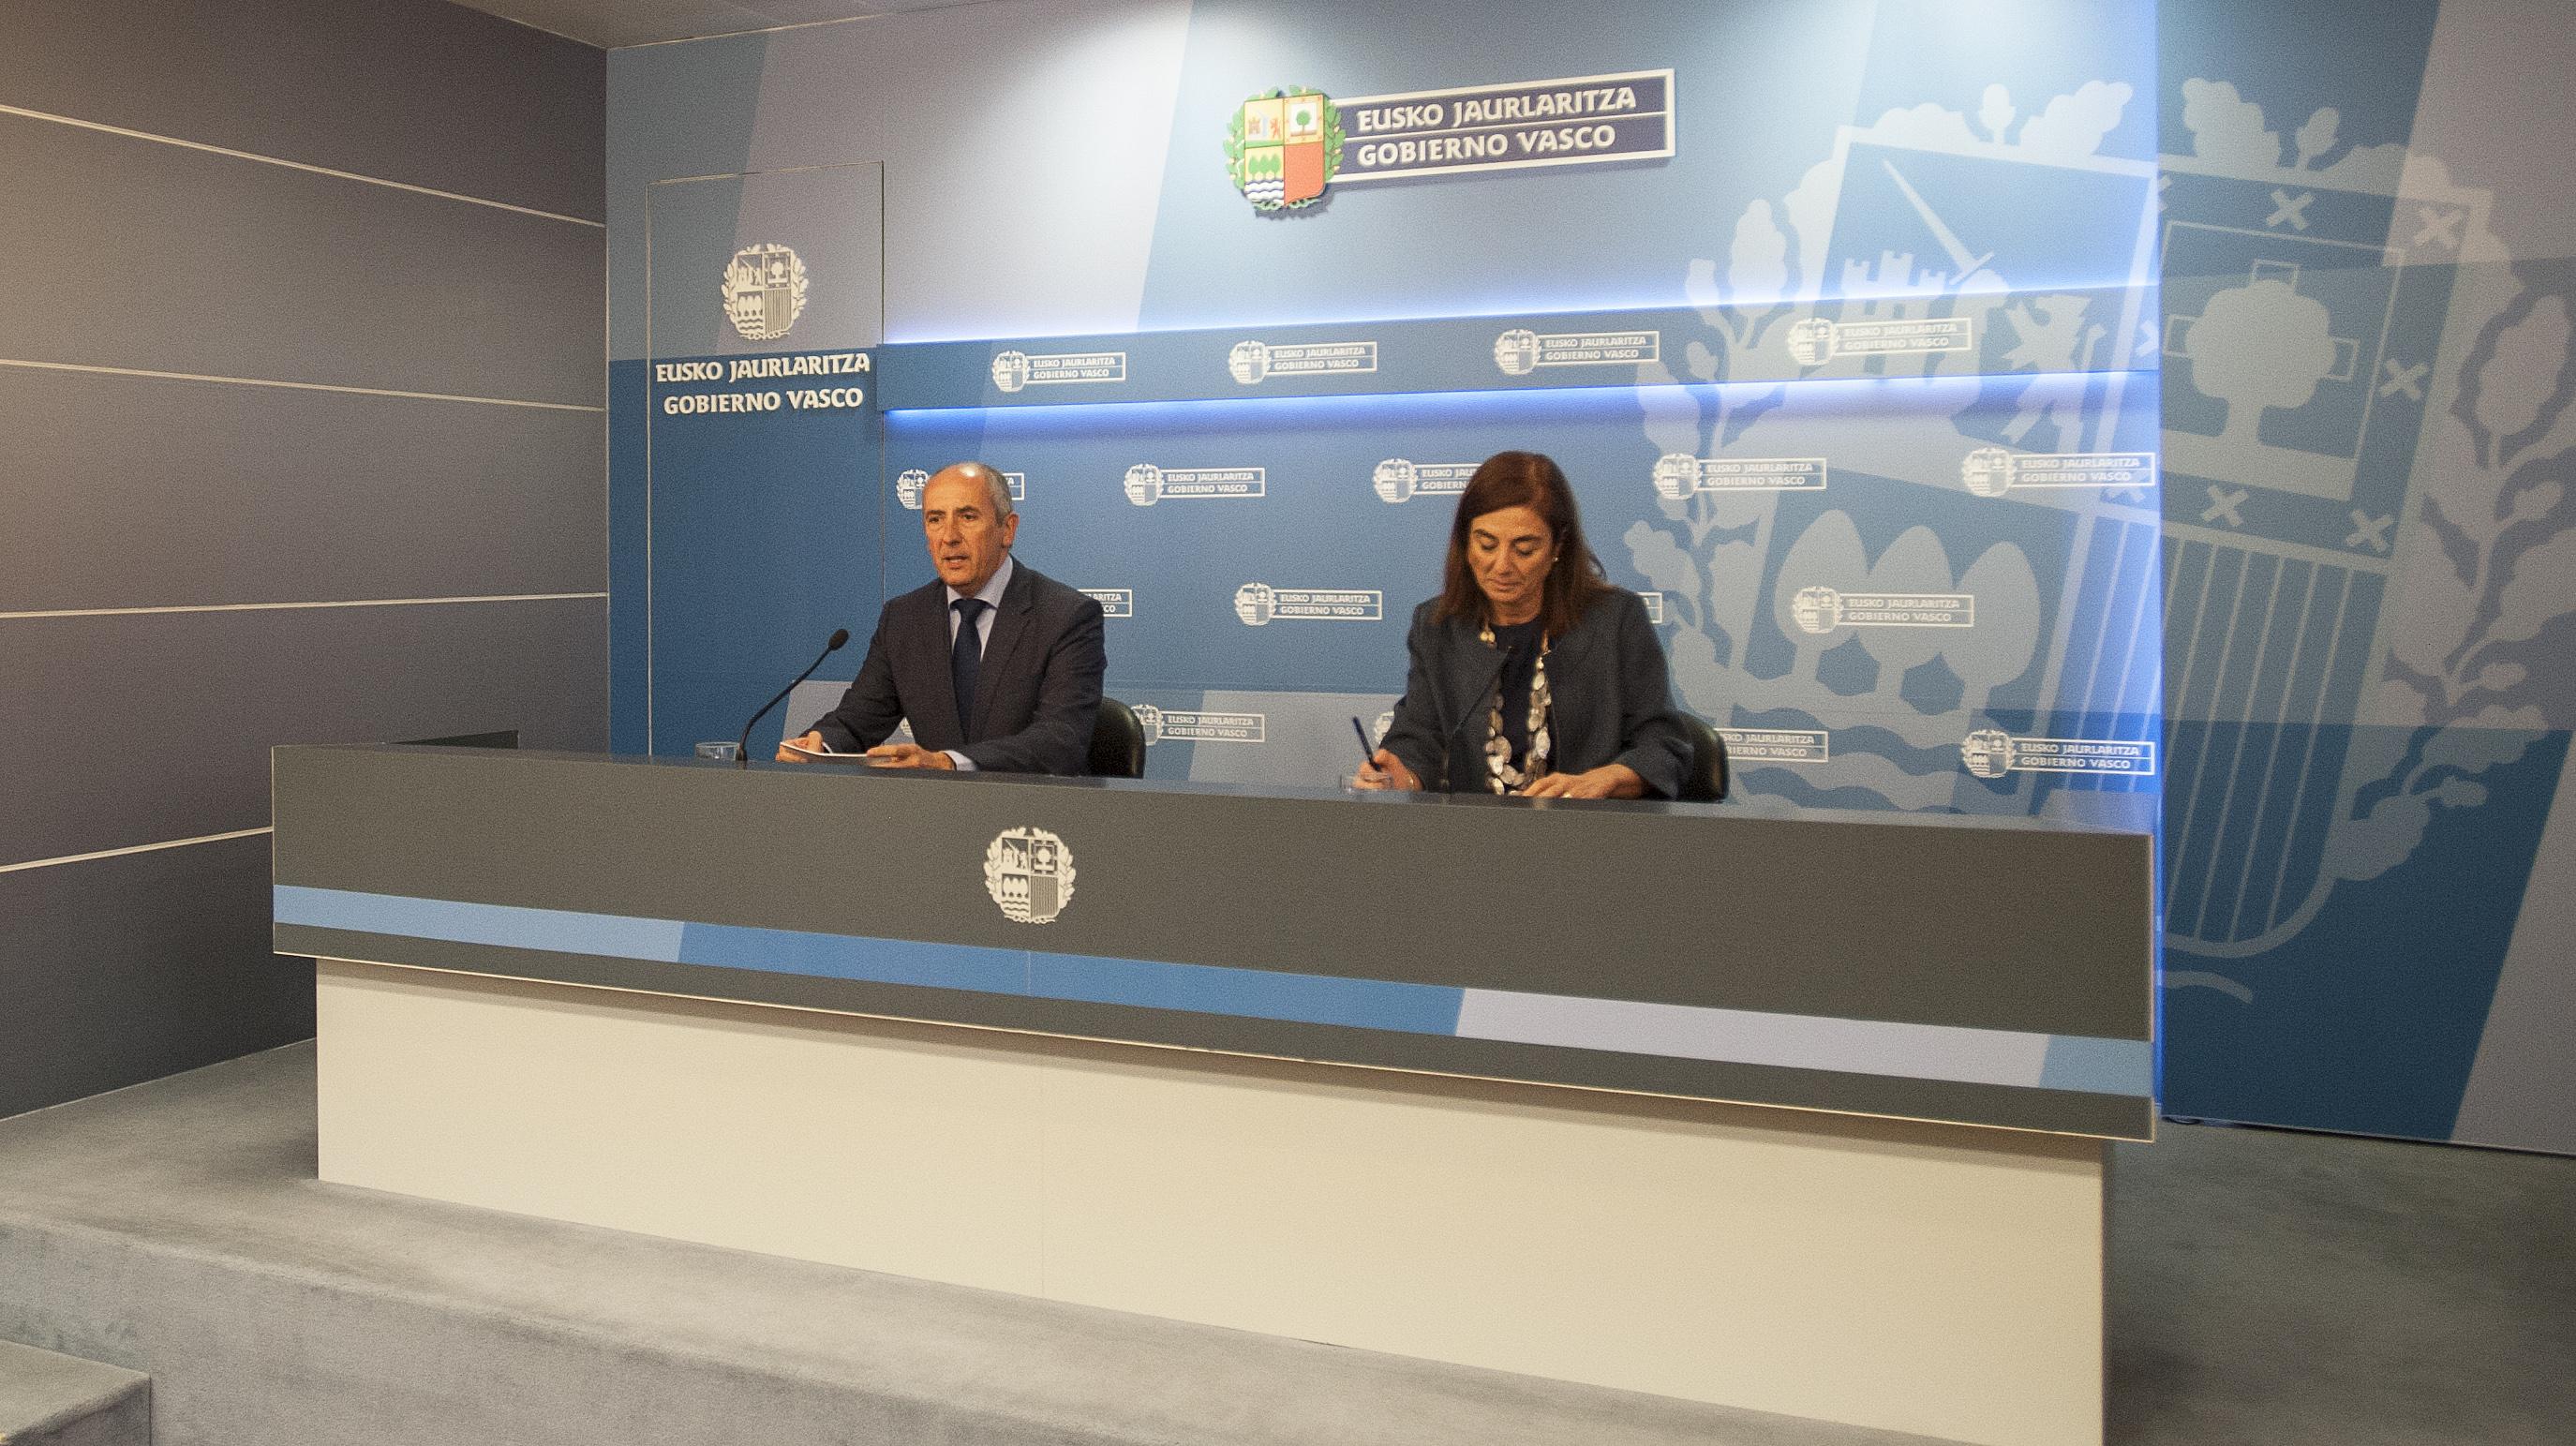 20151110_consejo_gobierno3.jpg